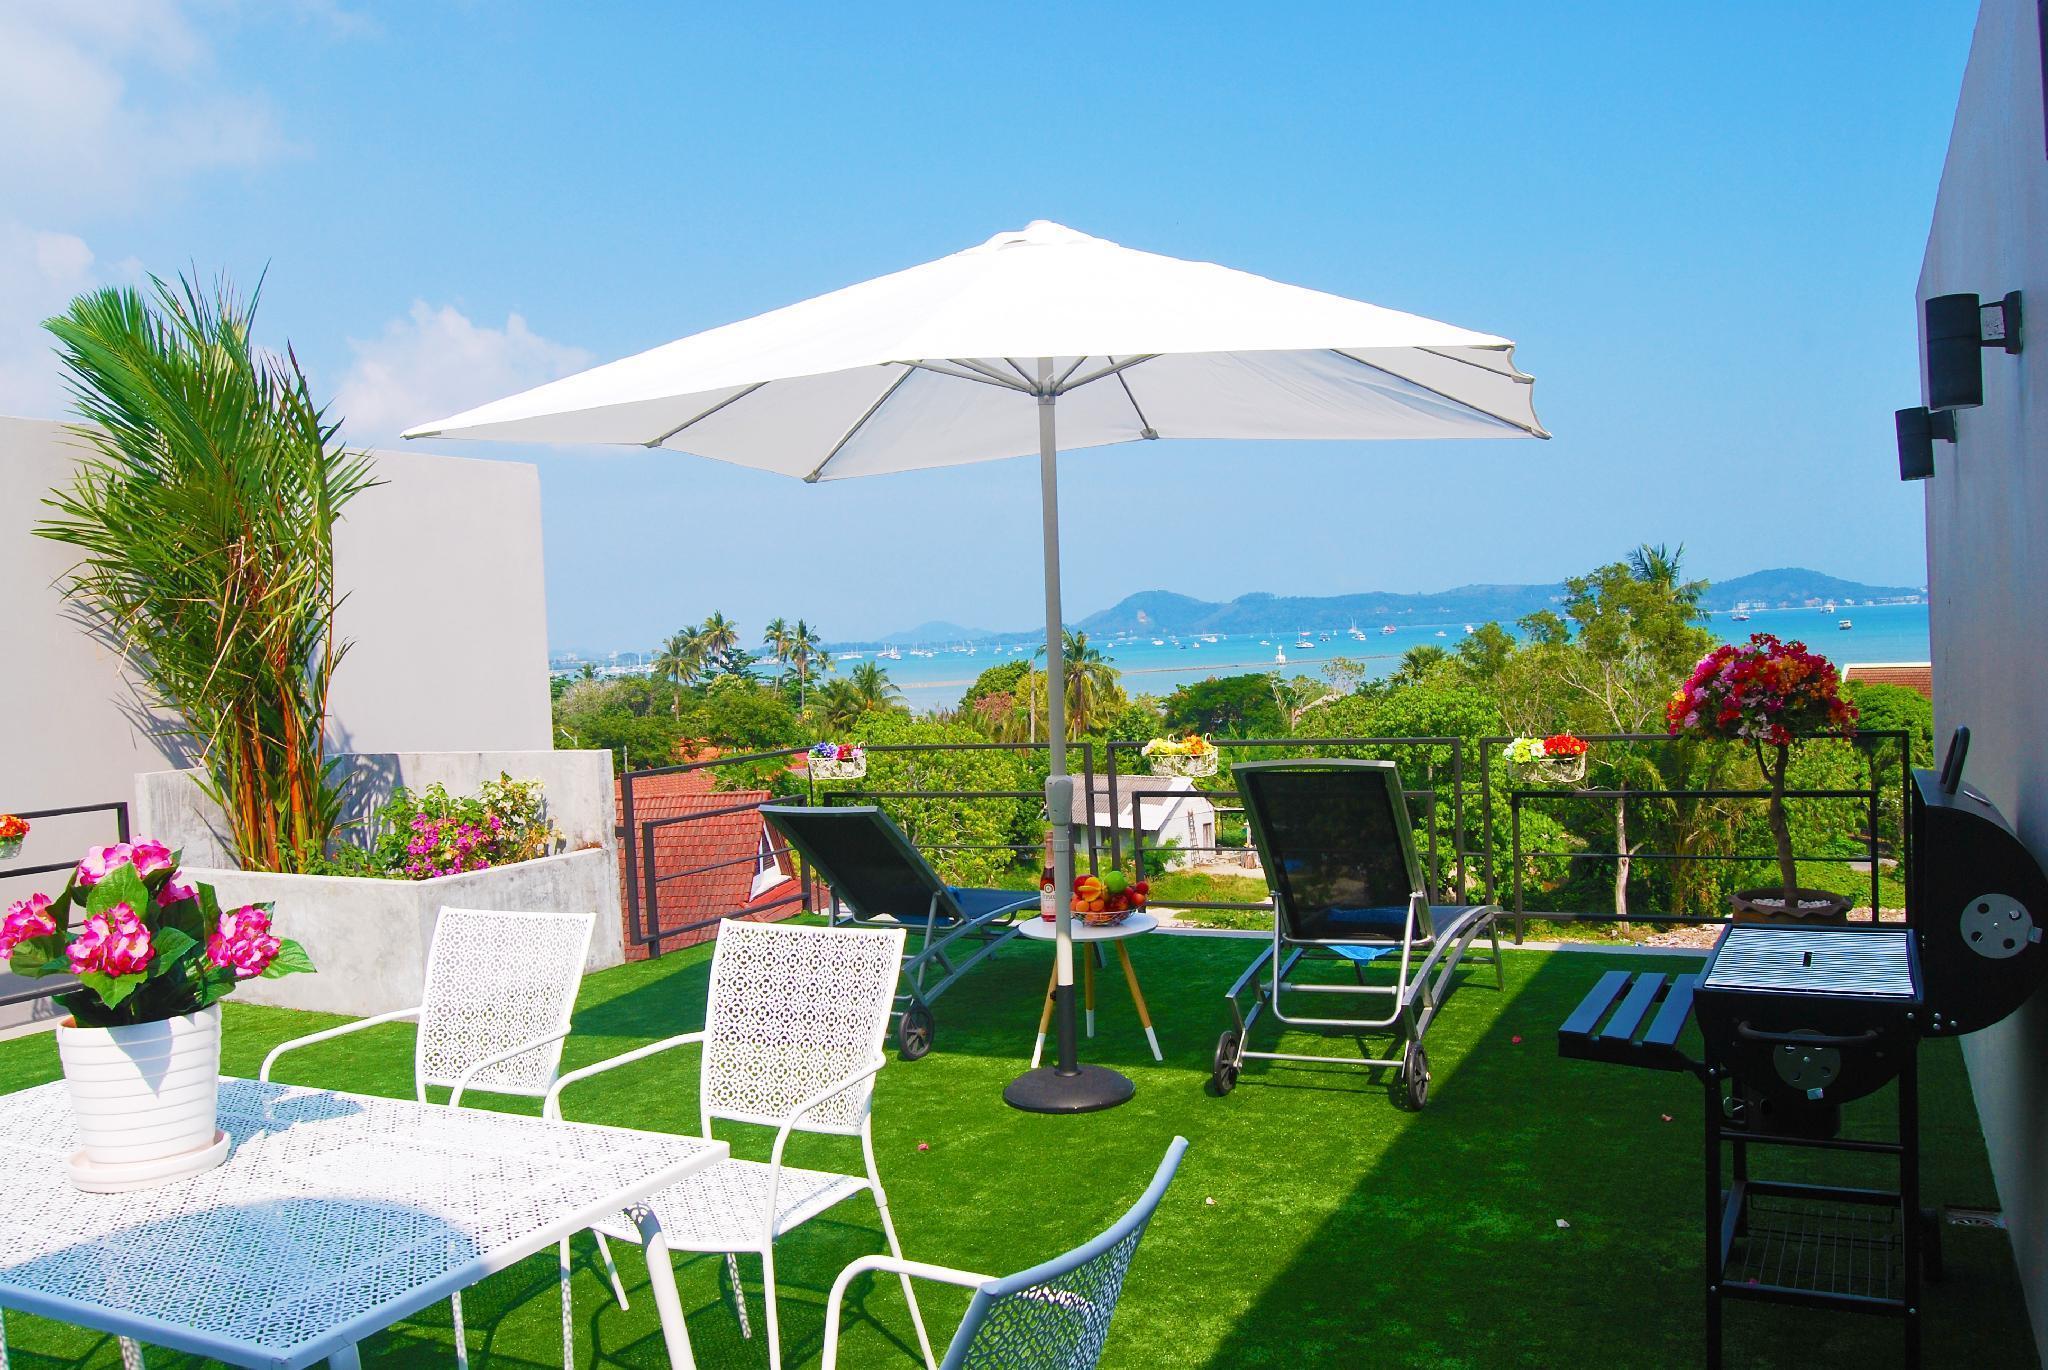 Luxury poolvilla near Rawai ,200m to private beach วิลลา 3 ห้องนอน 4 ห้องน้ำส่วนตัว ขนาด 400 ตร.ม. – หาดราไวย์